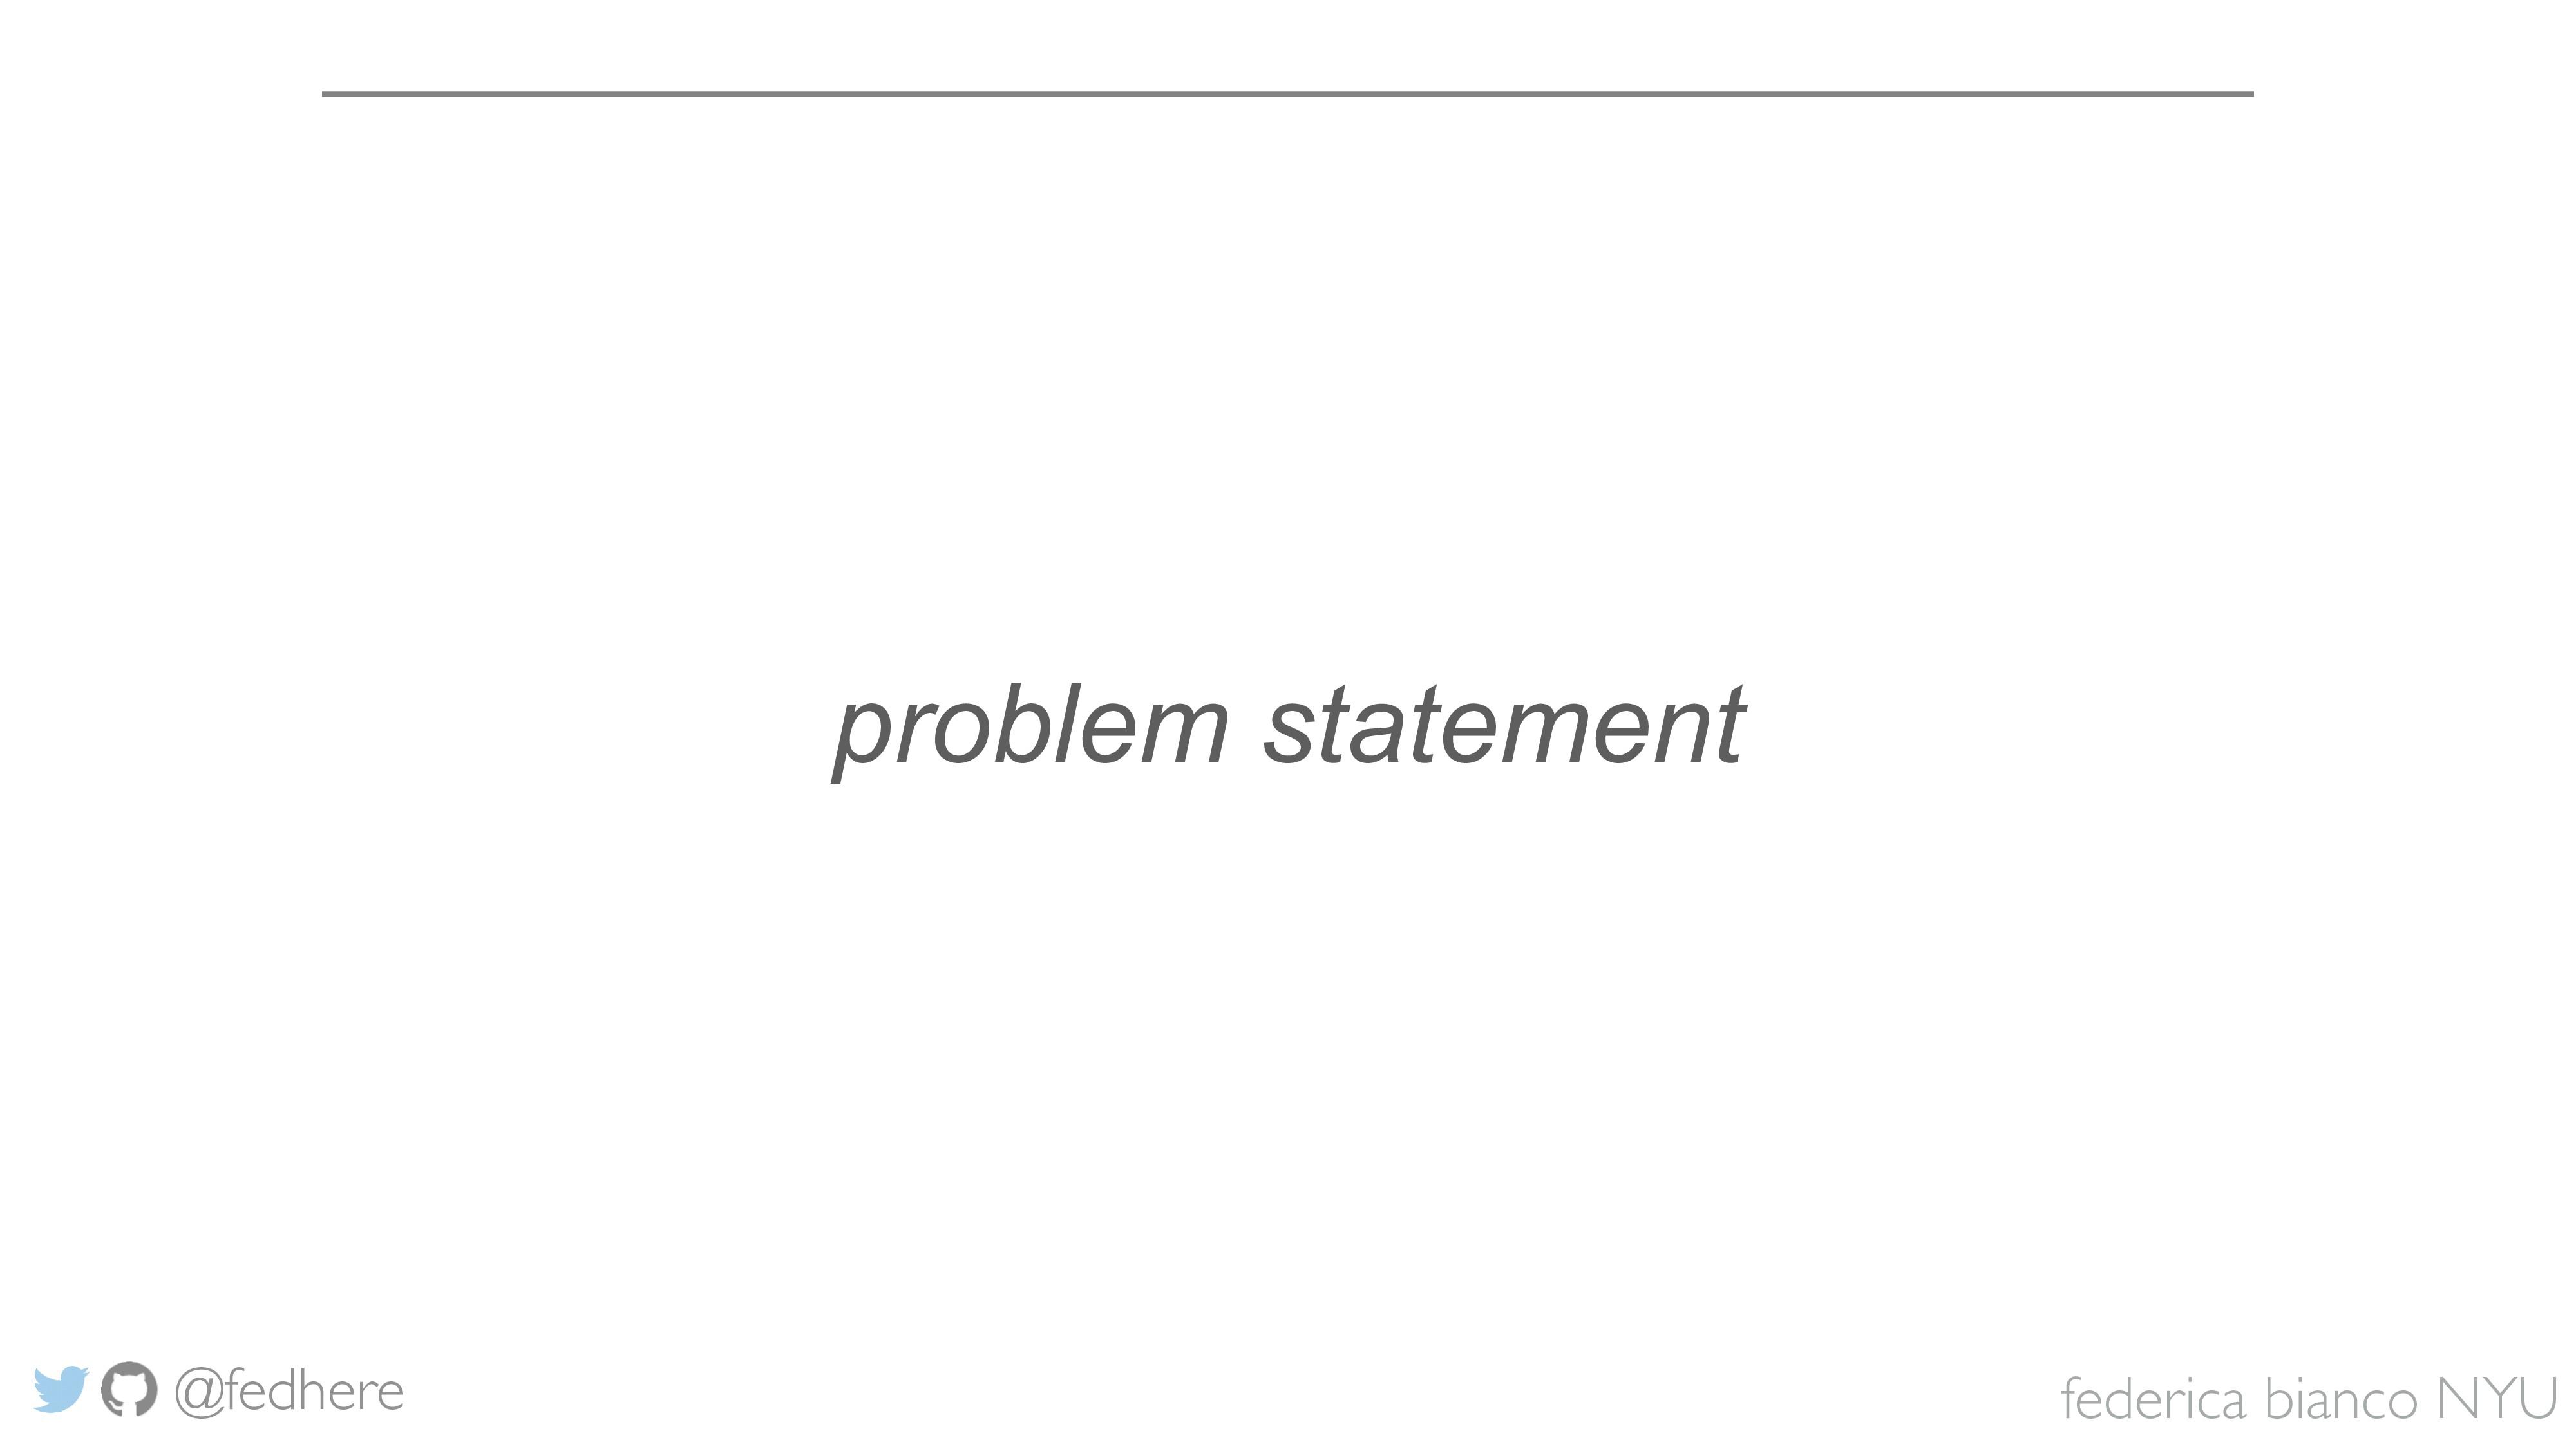 federica bianco NYU @fedhere problem statement